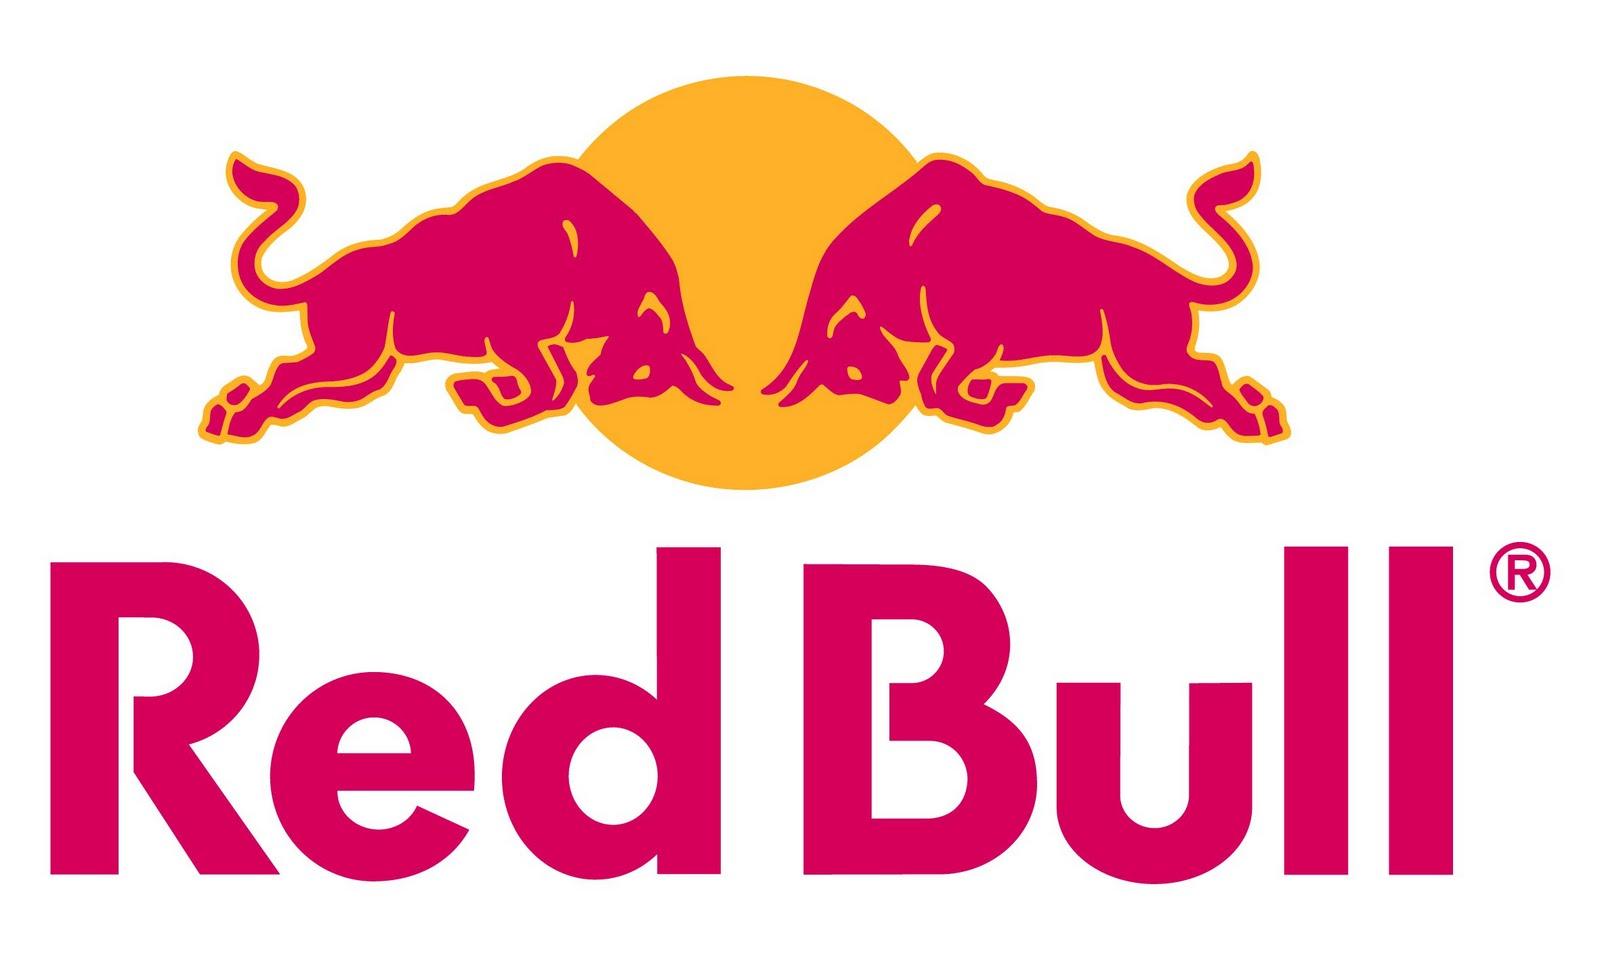 http://1.bp.blogspot.com/-CX_msUEE_Xw/TdUVEt0FUkI/AAAAAAAAUEk/3u6x1C6-wus/s1600/red_bull_logo.jpg